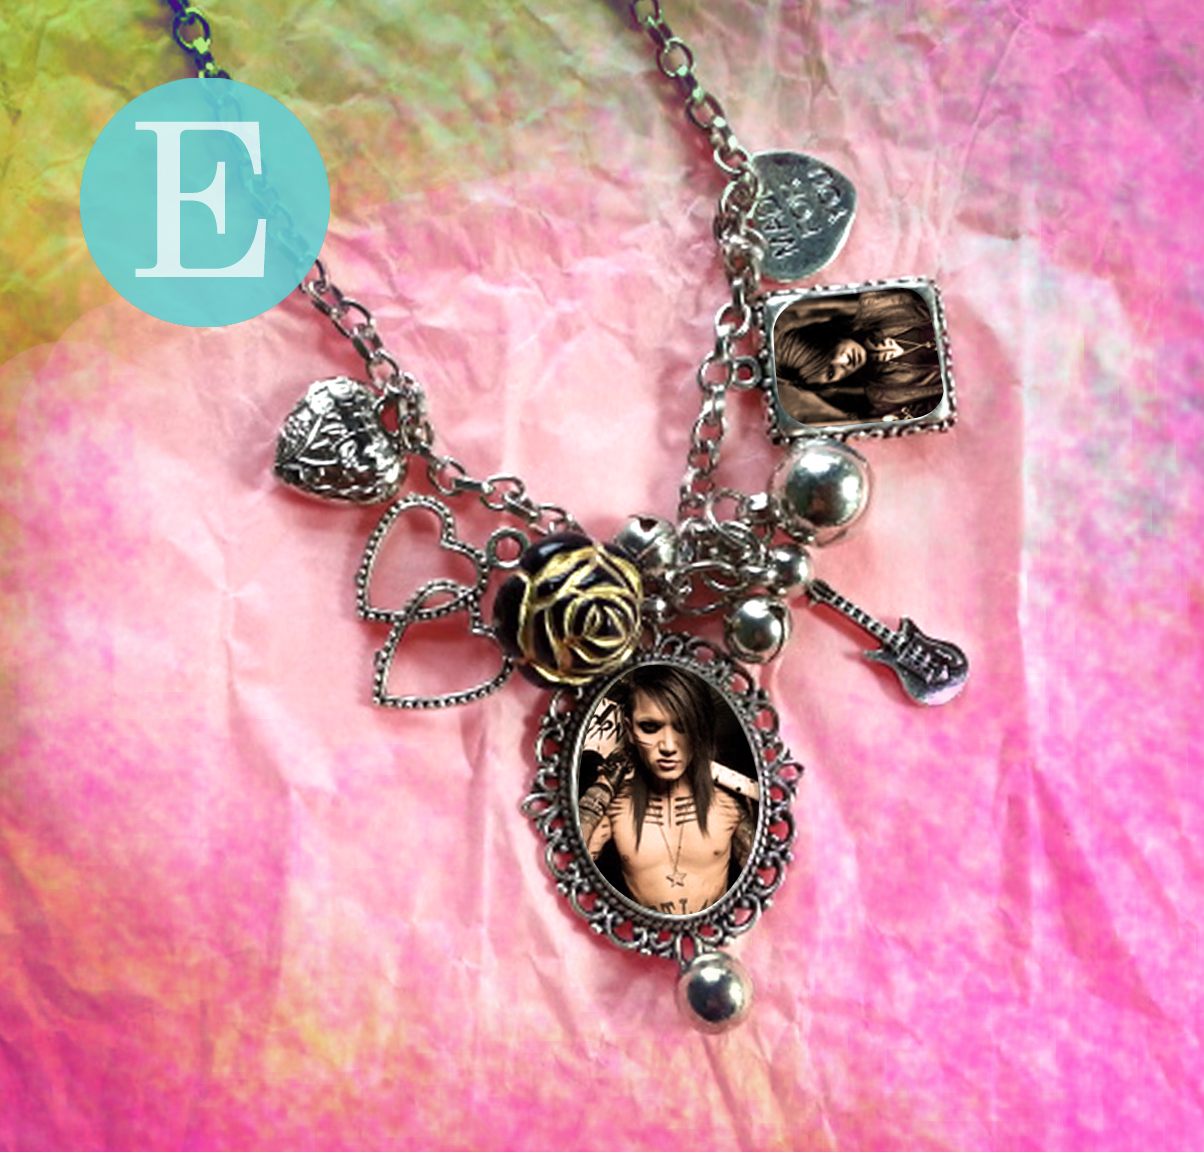 bvb_black_veil_brides_ashley_purdy_charm_necklace_necklaces_2.jpg